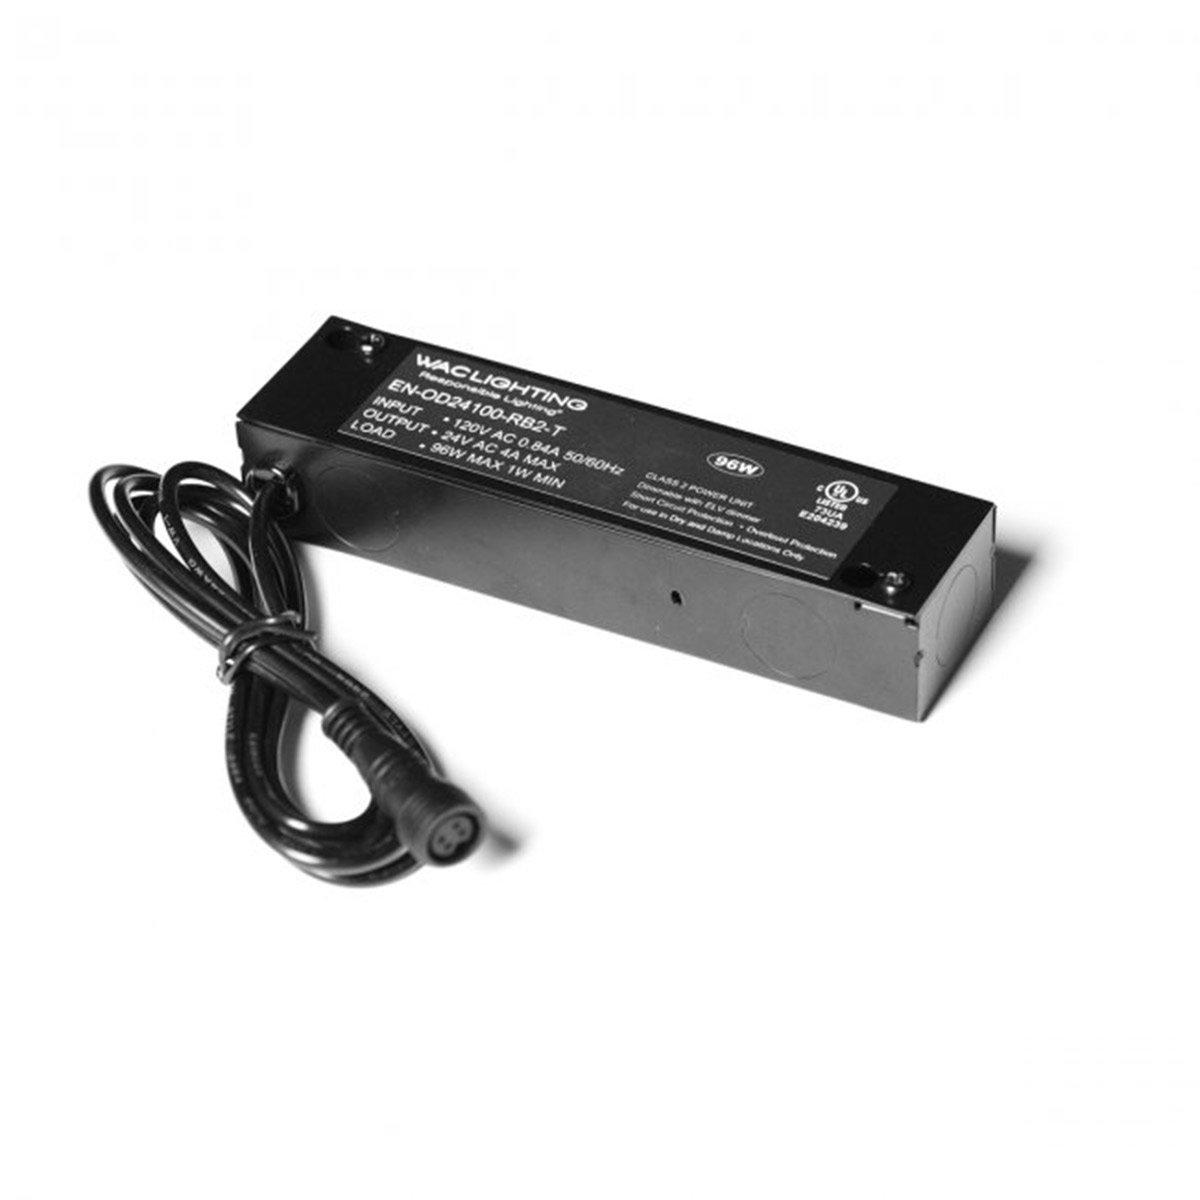 WAC Lighting EN-OD24100-RB2-T Transformer Remote Enclosed Electronic Outdoor Rgb 120V Input 24V Output 100 Watt, Black